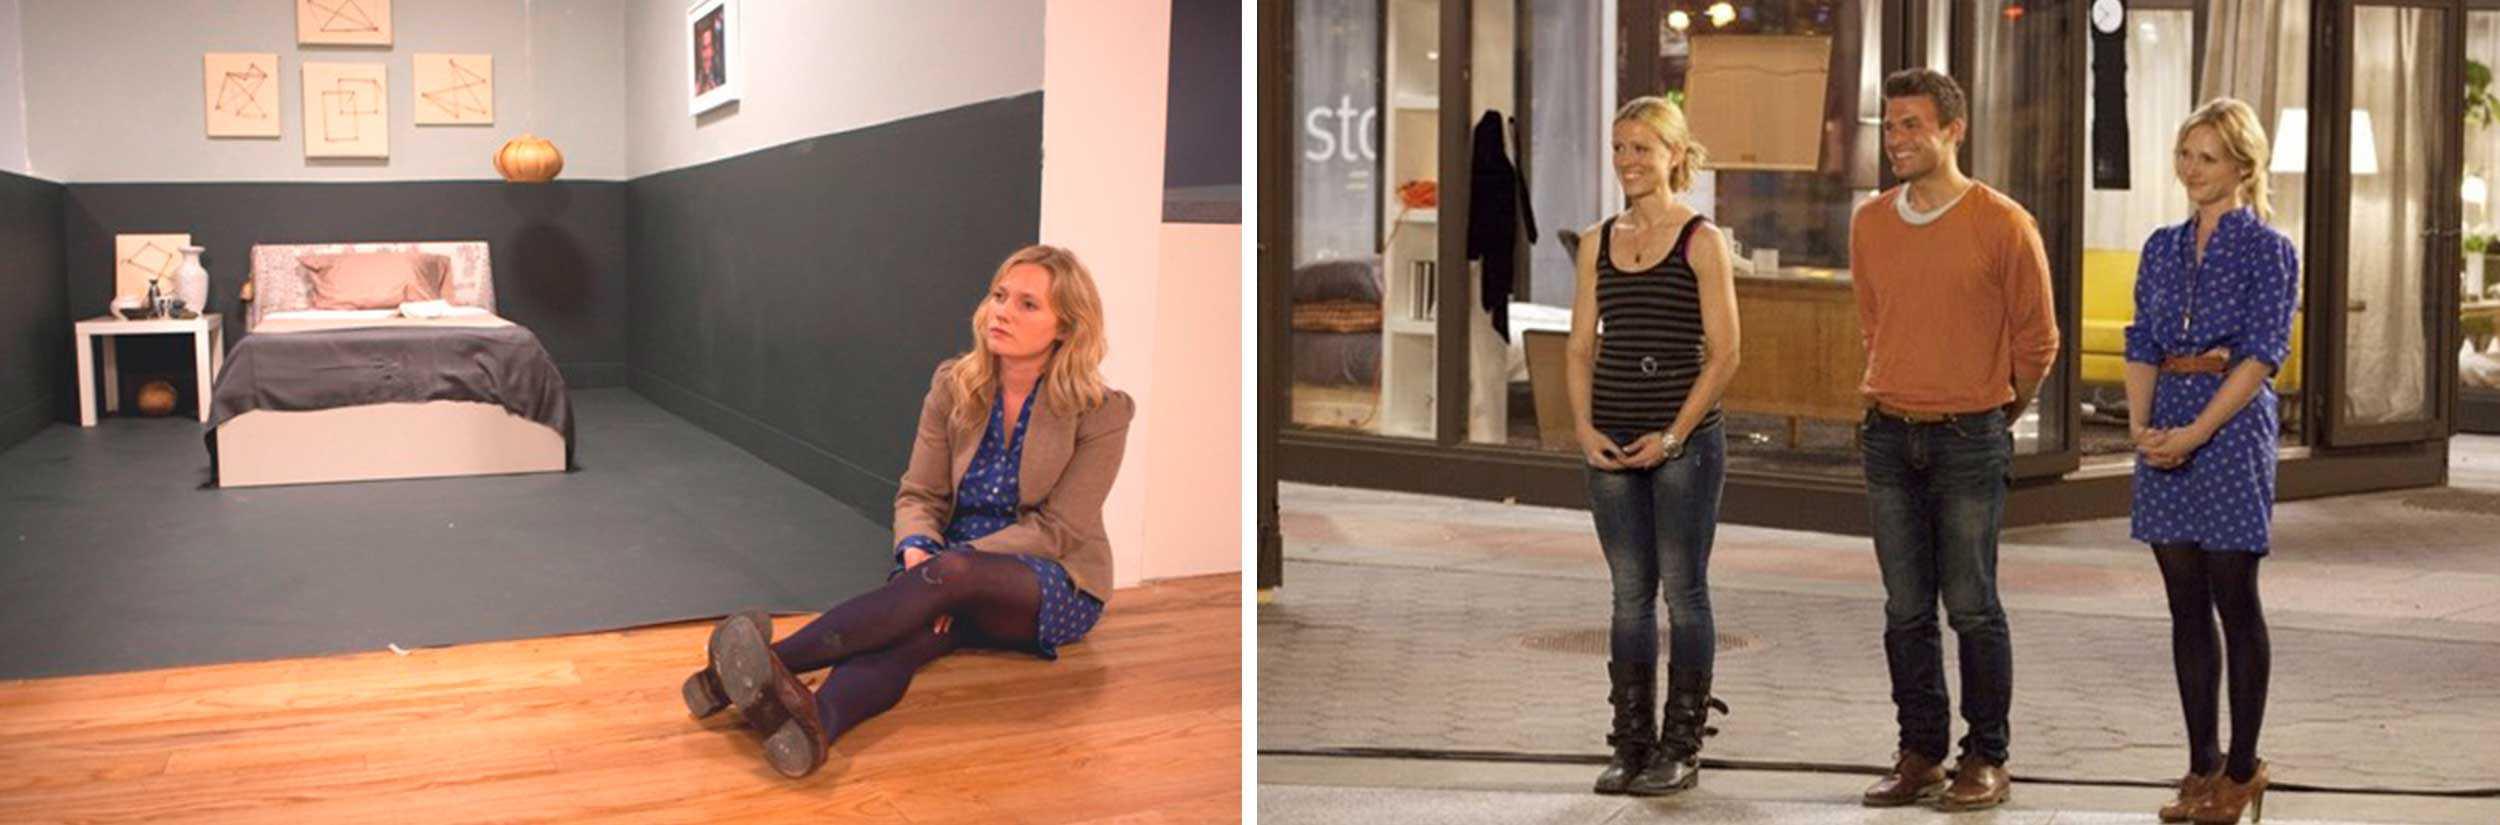 emily henderson sustainable fashion7